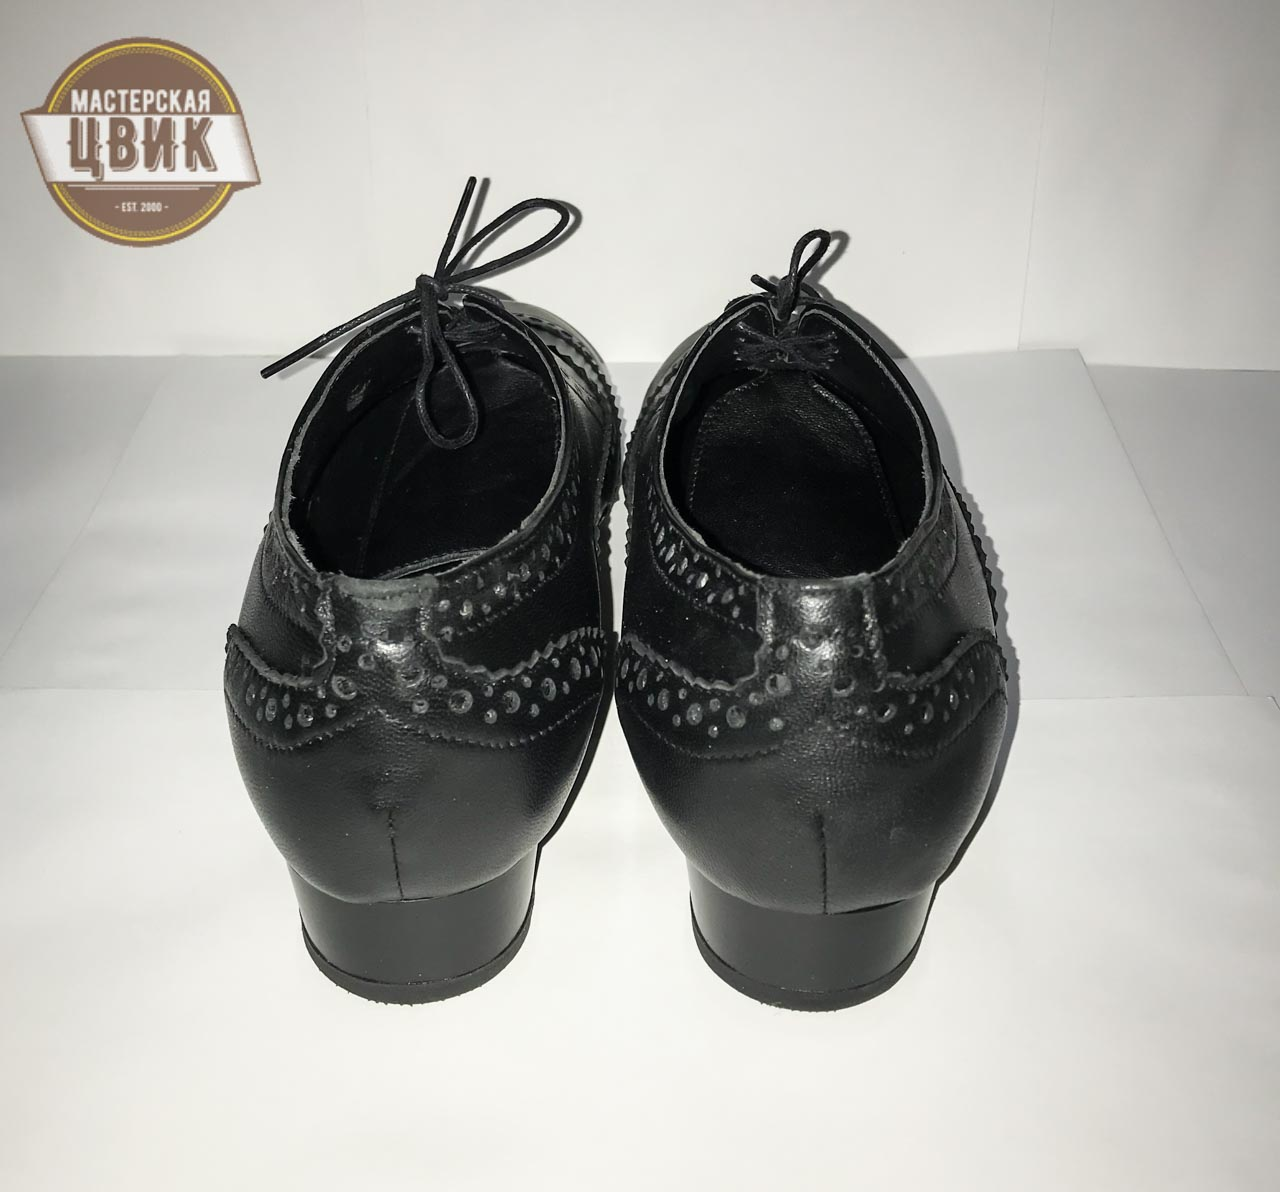 individualnyj-poshiv-obuvi-minsk-10 Индивидуальный пошив обуви